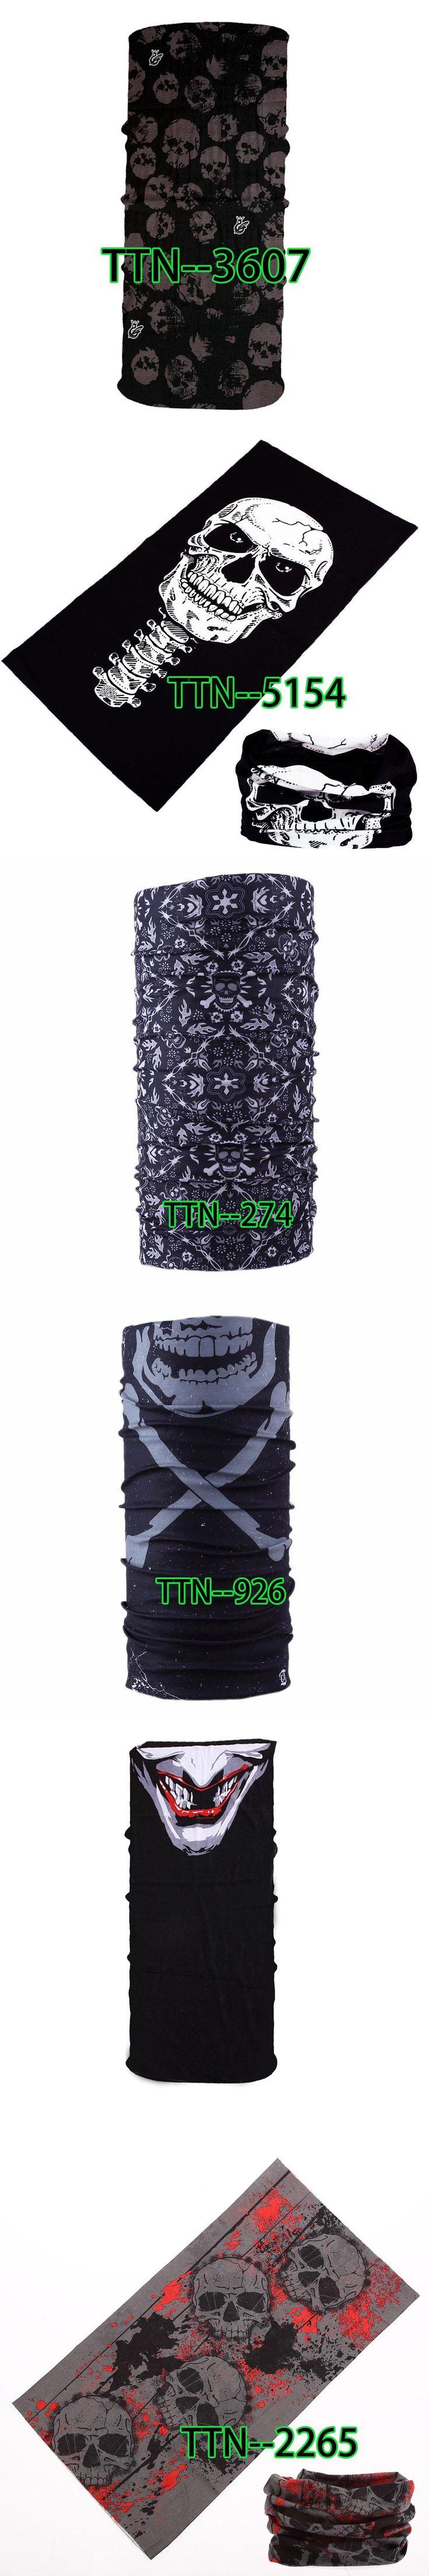 Multi-function Scarf Fashion Skull Face Masks   Headband Neck Bandana Scarf 1PCS